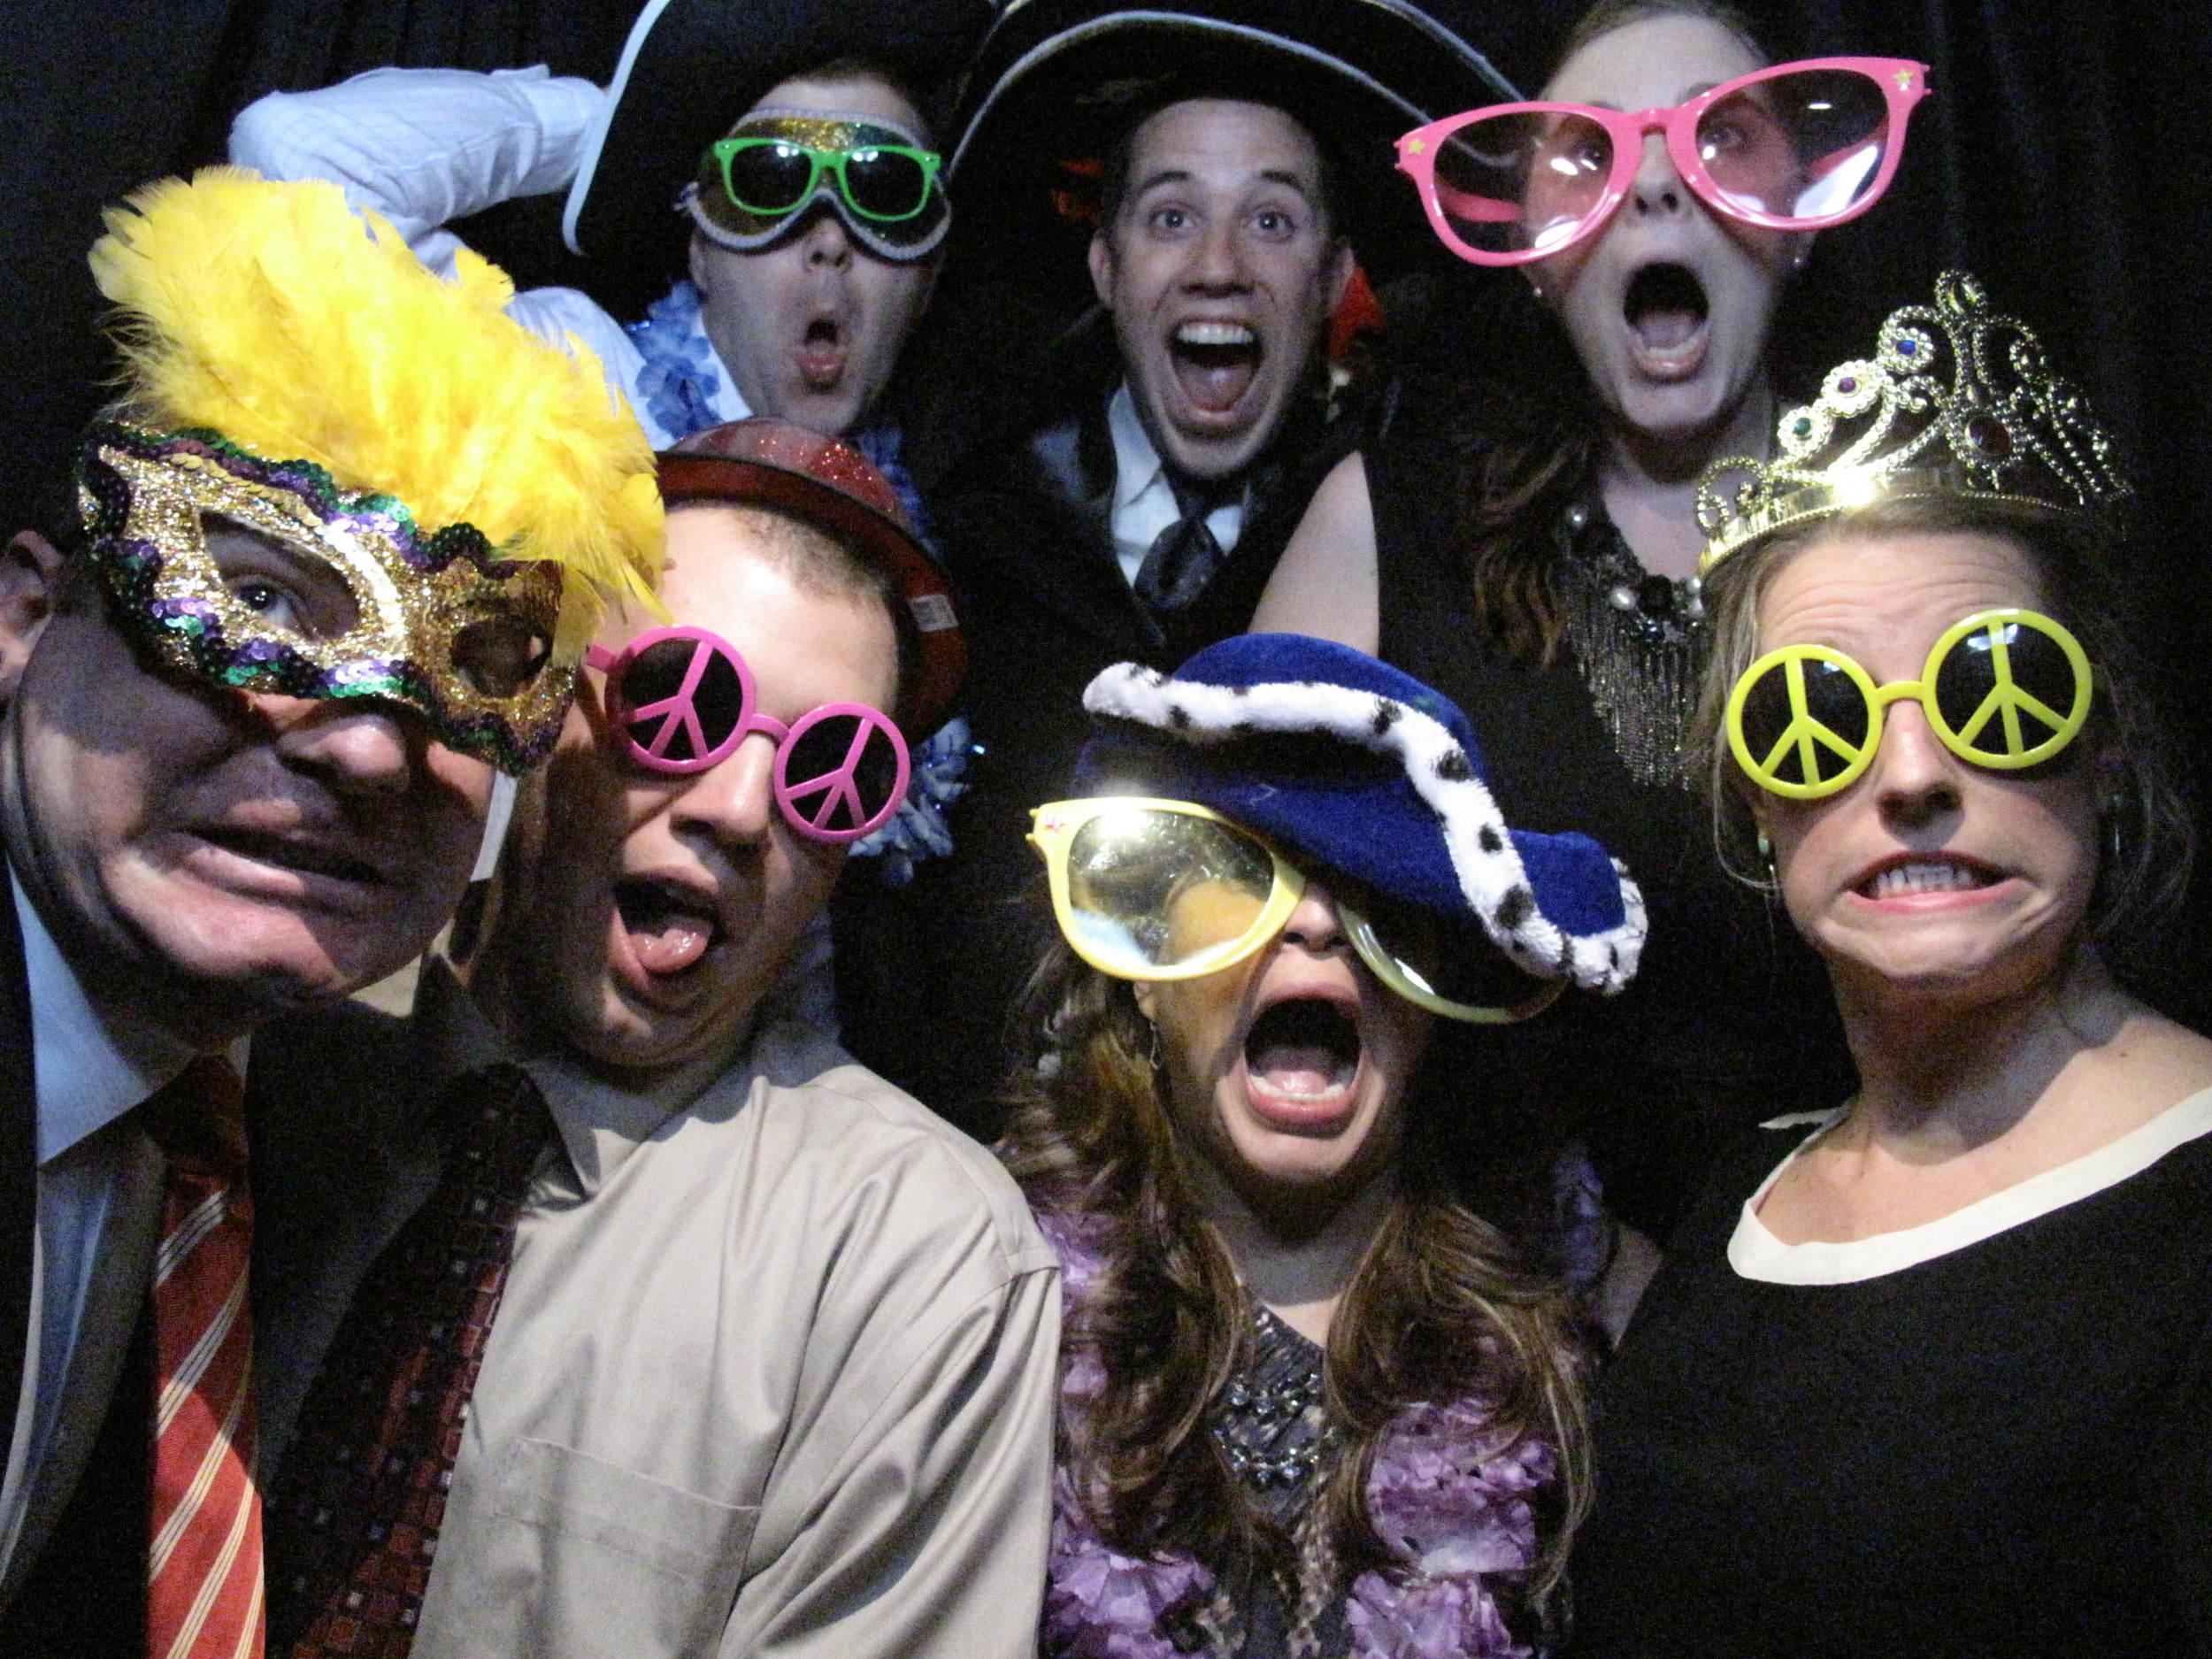 Snapshot Photobooths at Dolce in Basking Ridge, New Jersey